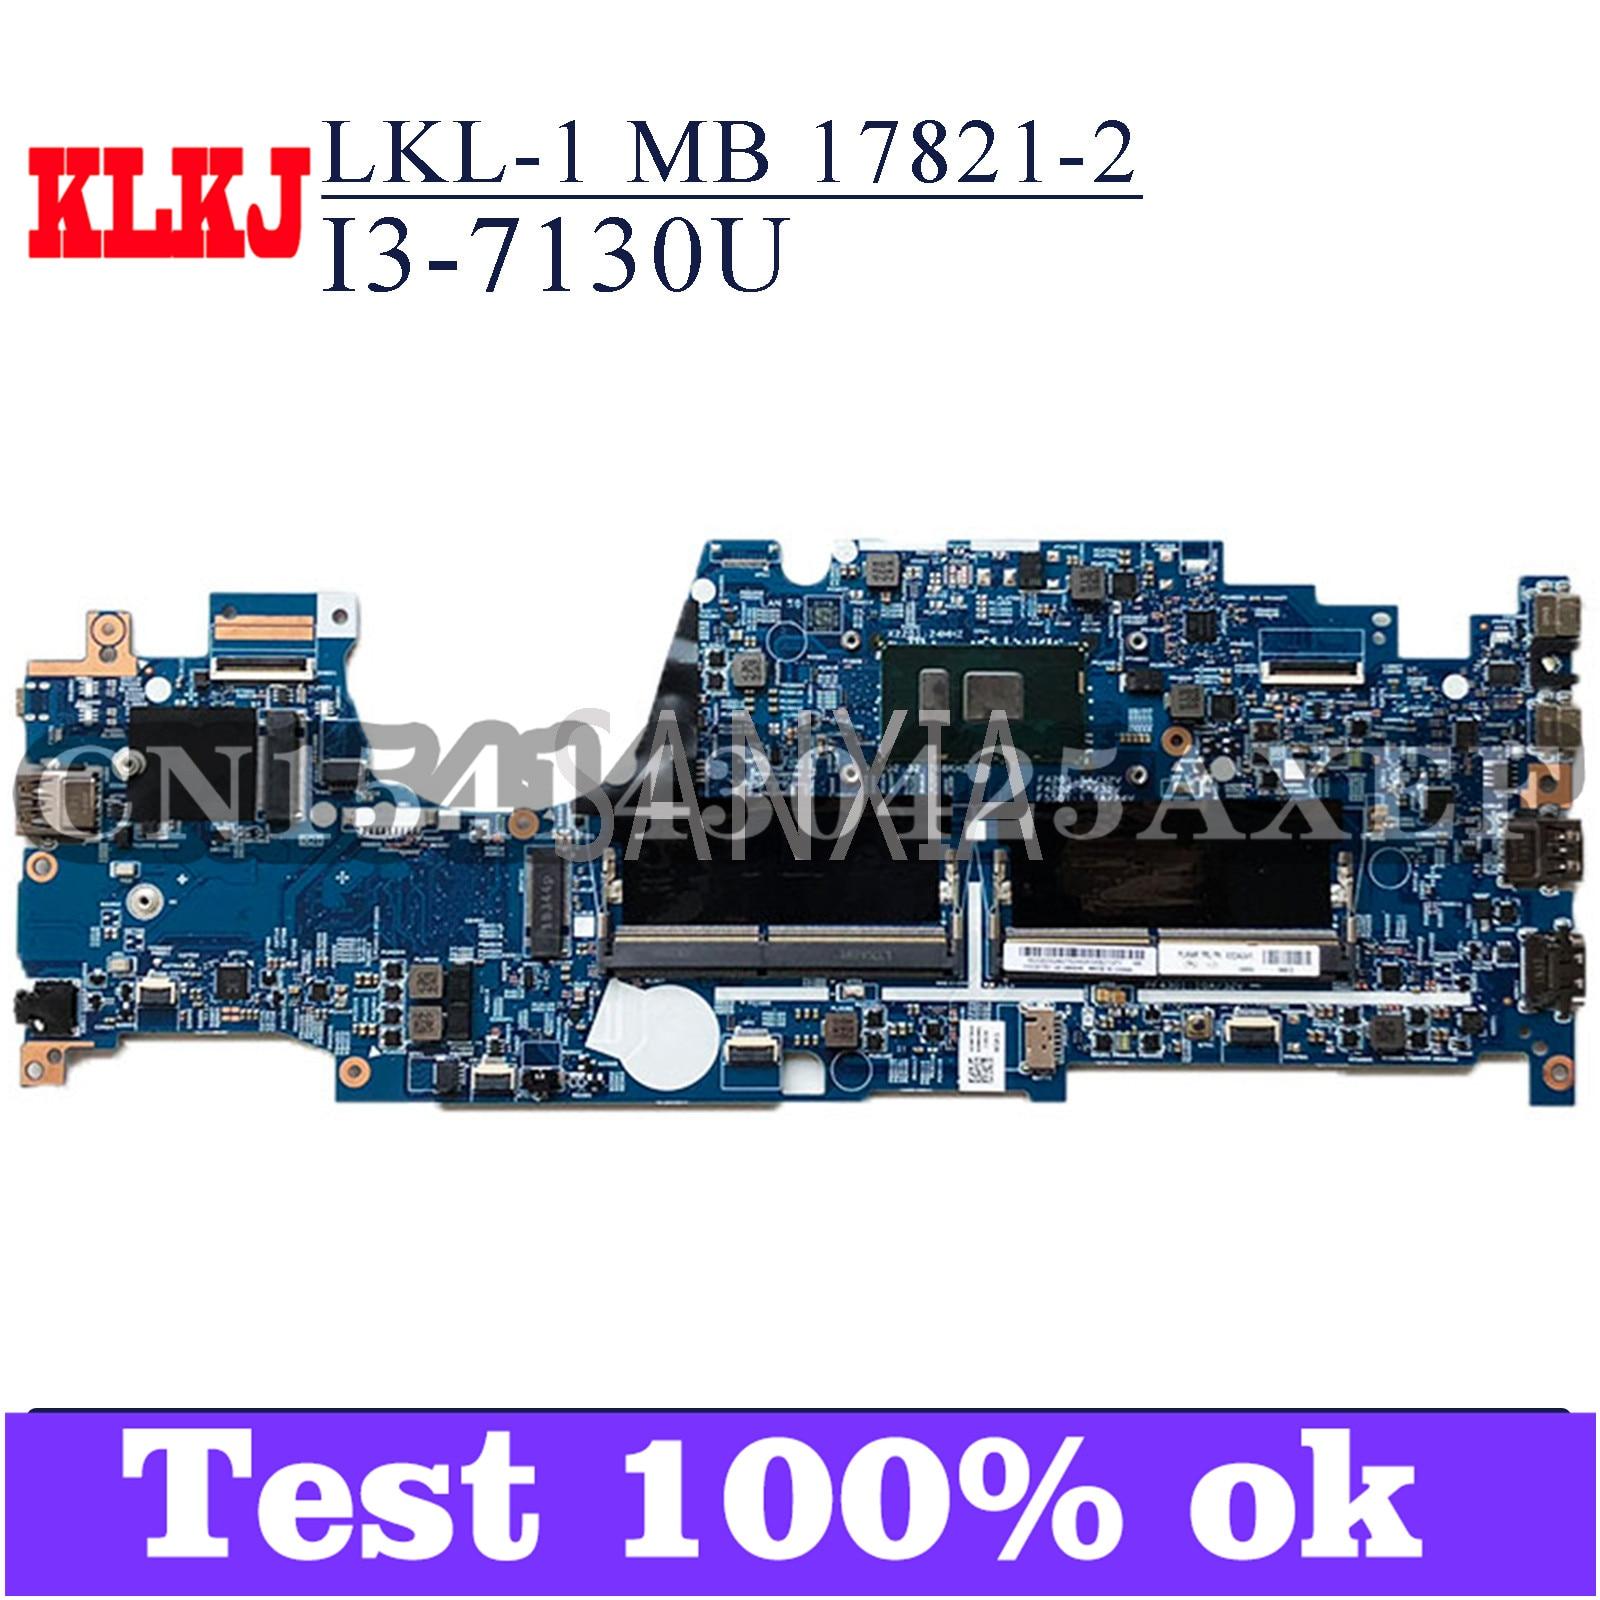 KLKJ LKL-1 MB 17821-2 материнская плата для ноутбука Lenovo Thinkpad L380 Йога оригинальная материнская плата I5-8250U